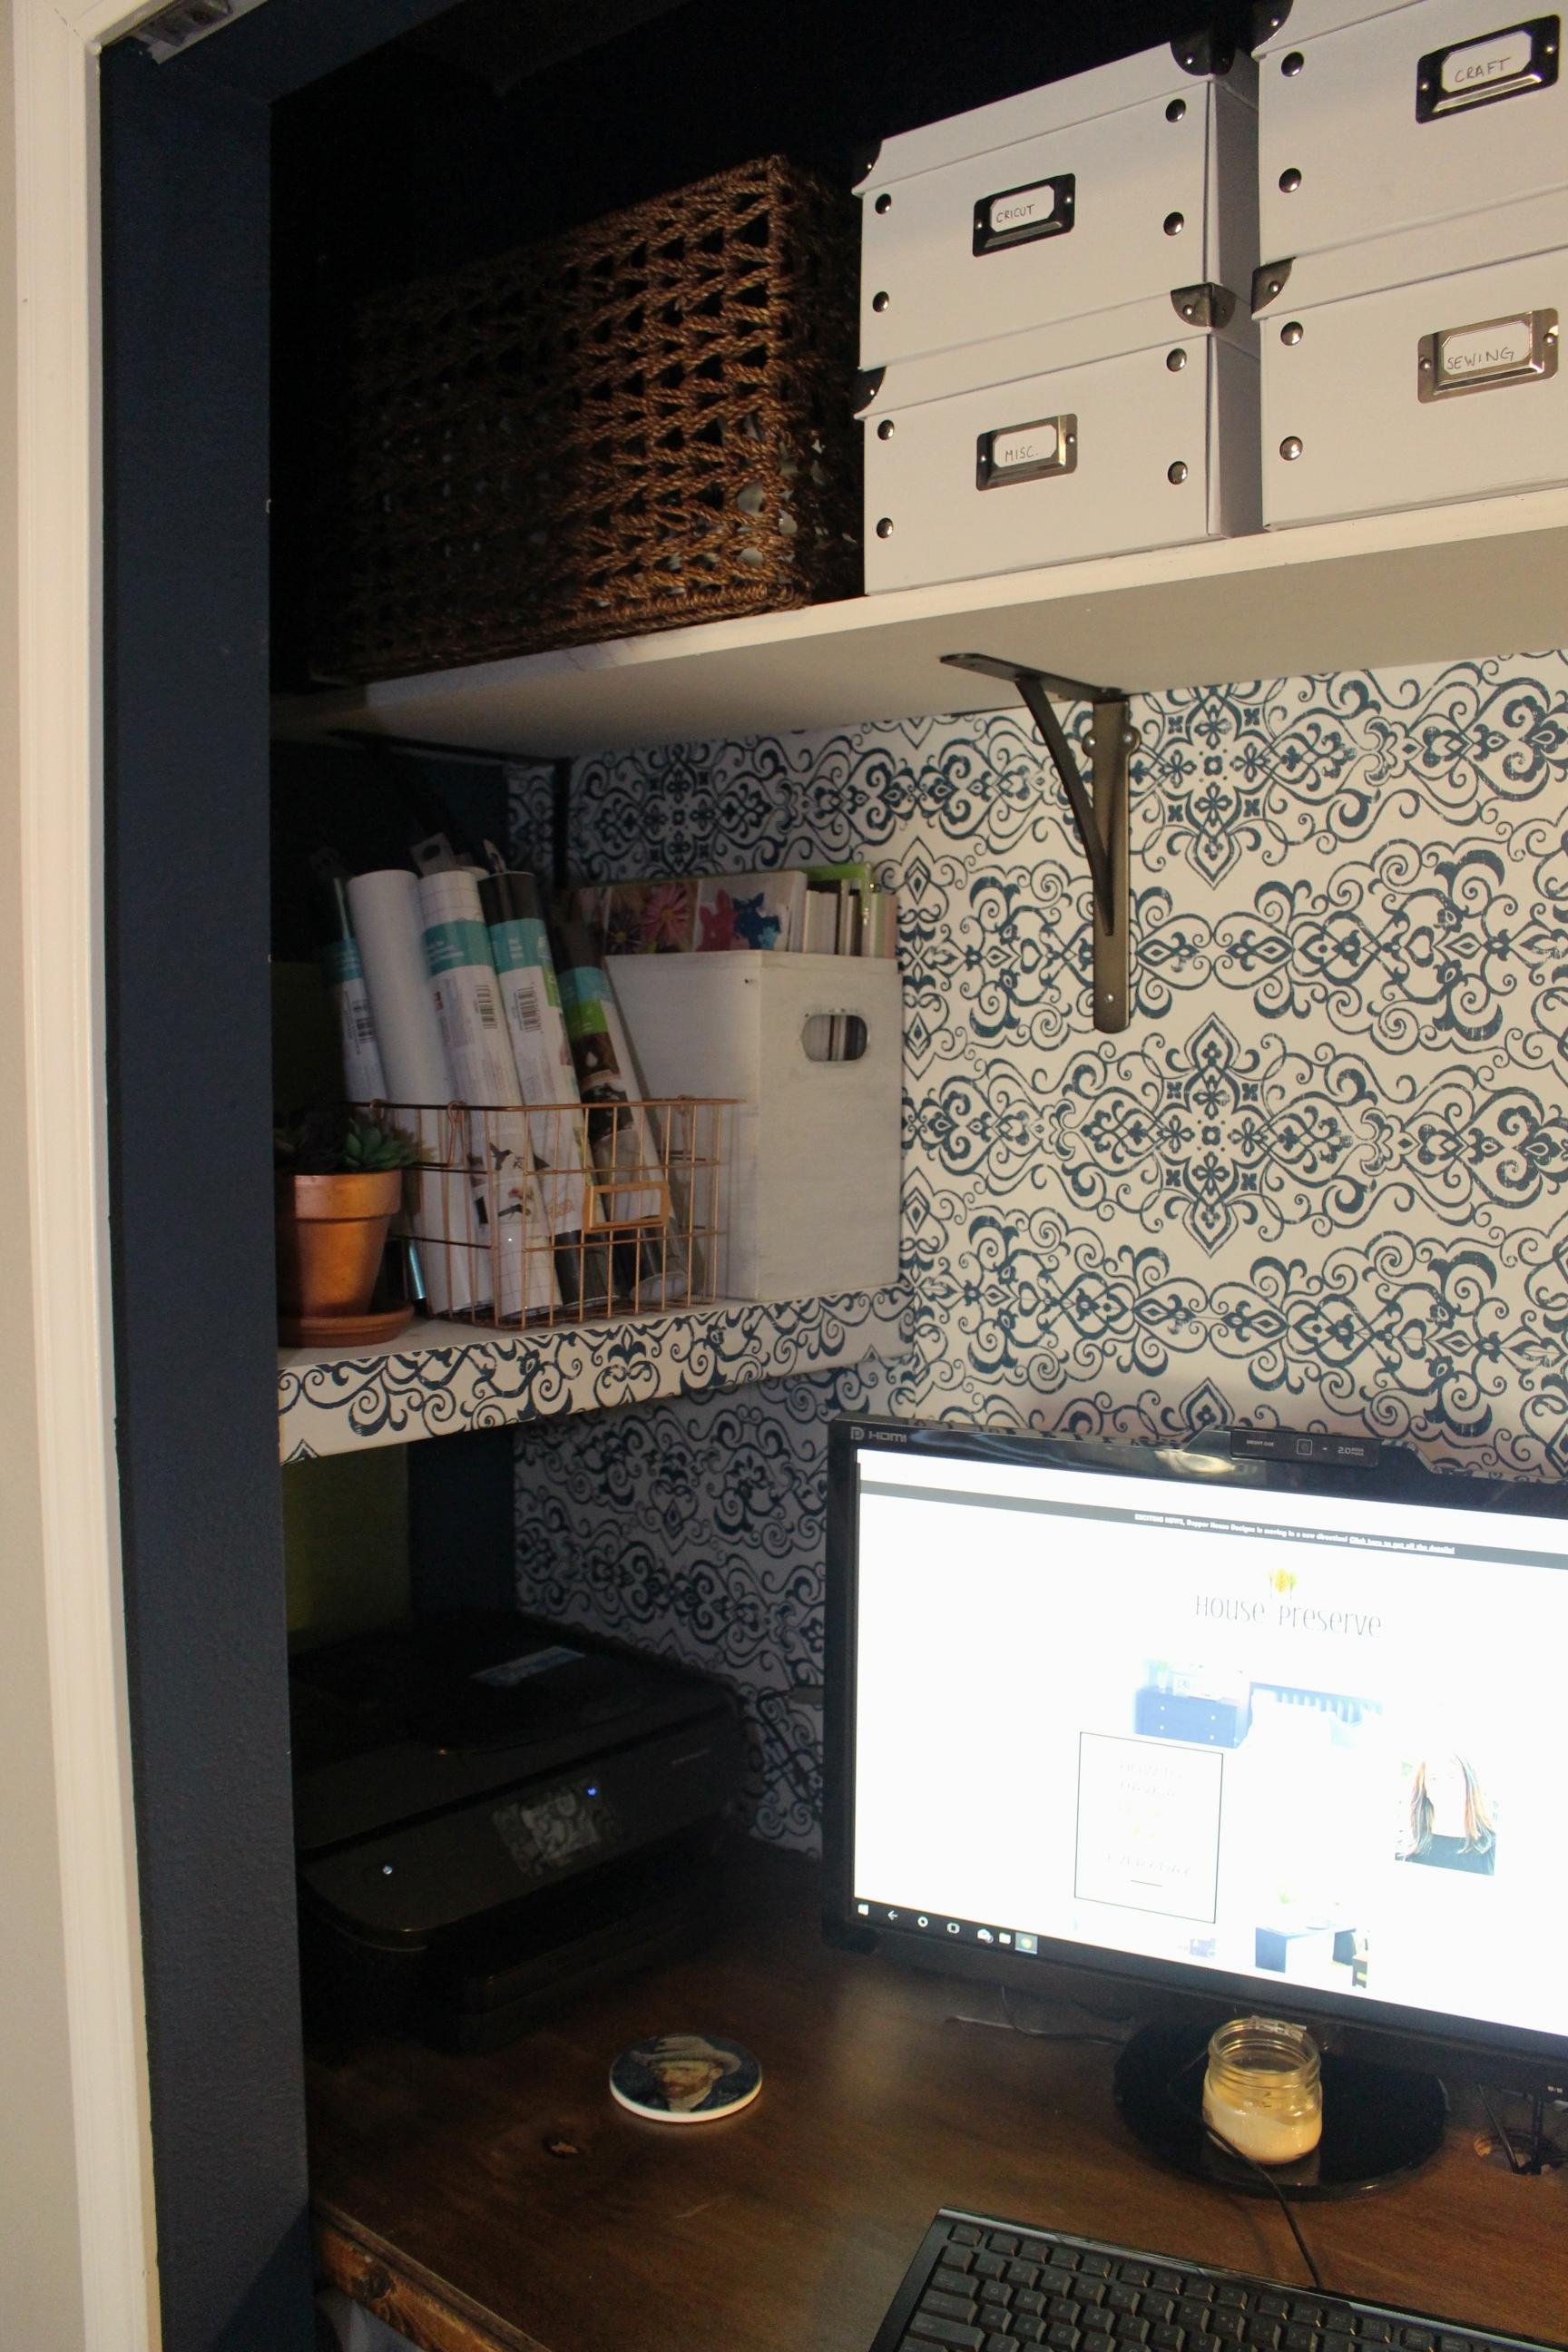 Why I Chose Squarespace To Design My Home Decor Blog House By